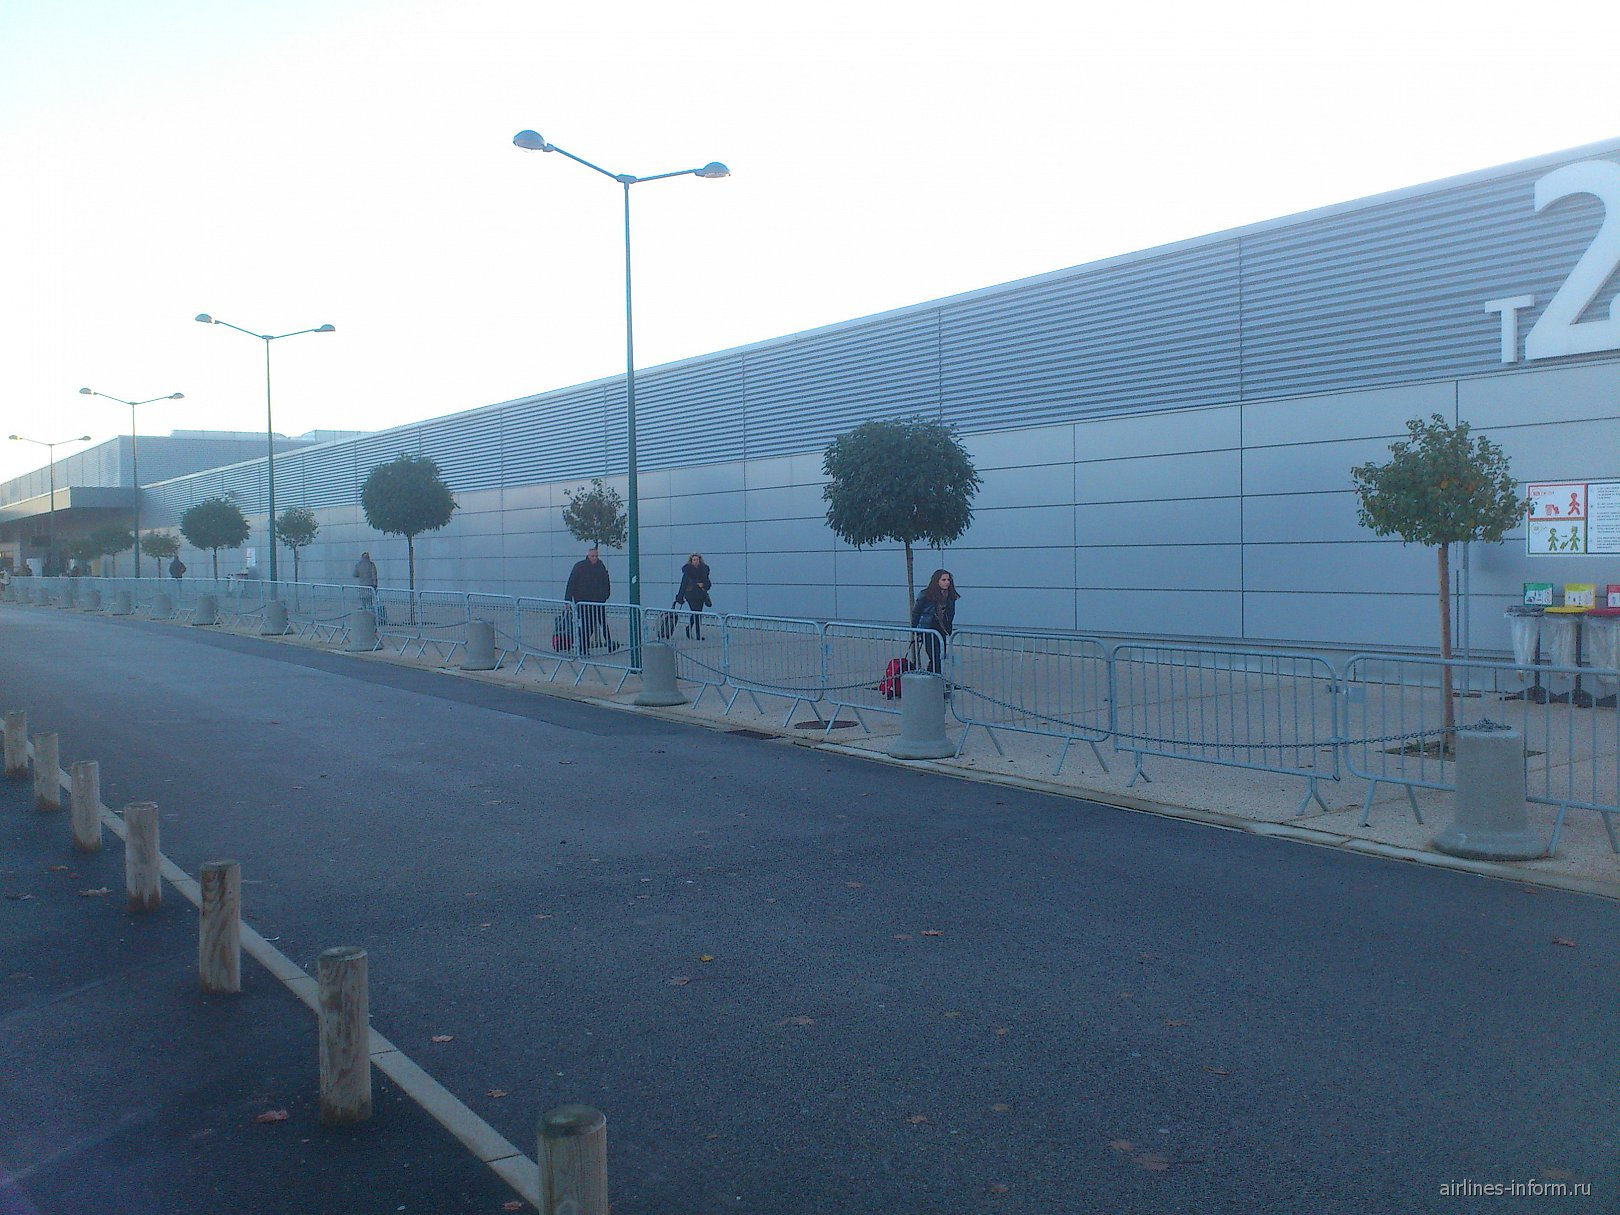 Терминал 2 аэропорта Париж Бове